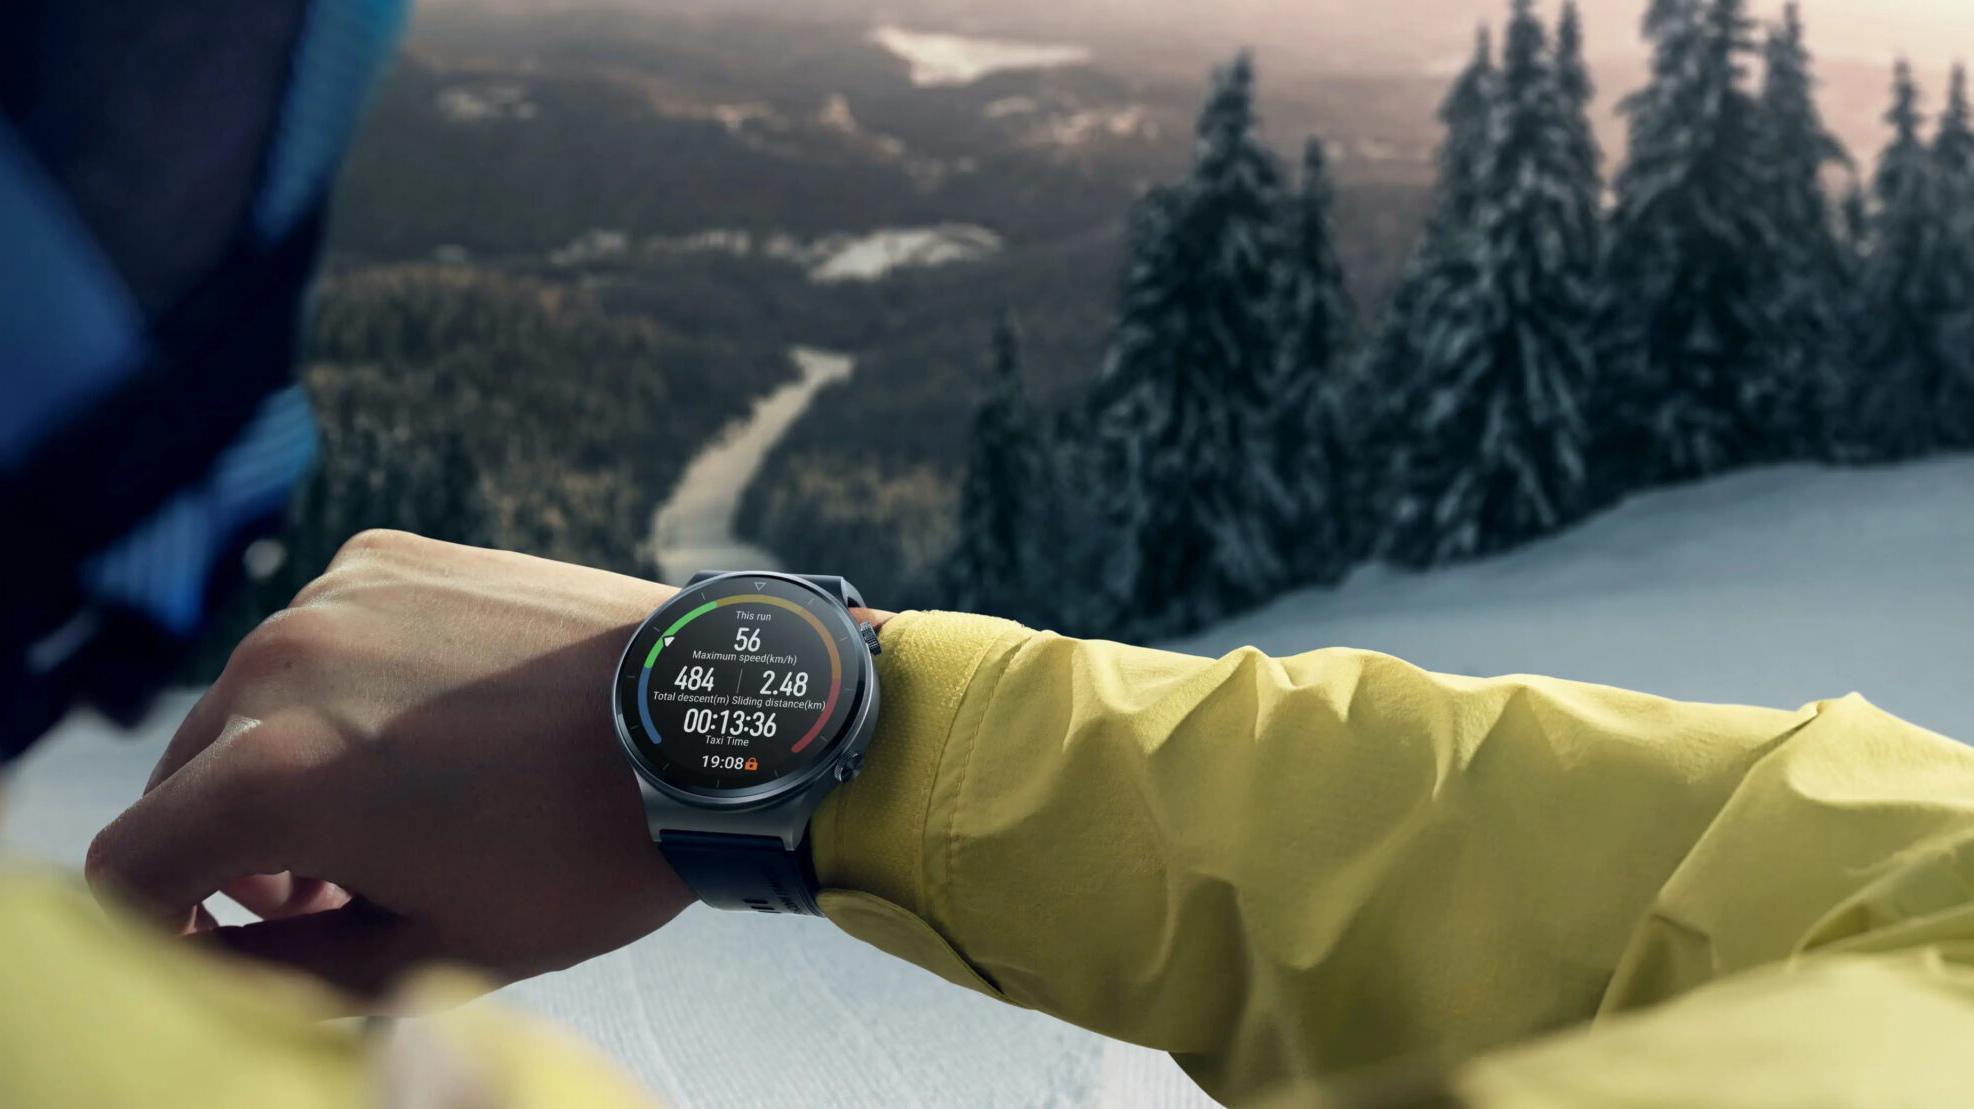 Huawei Watch GT Pro 2